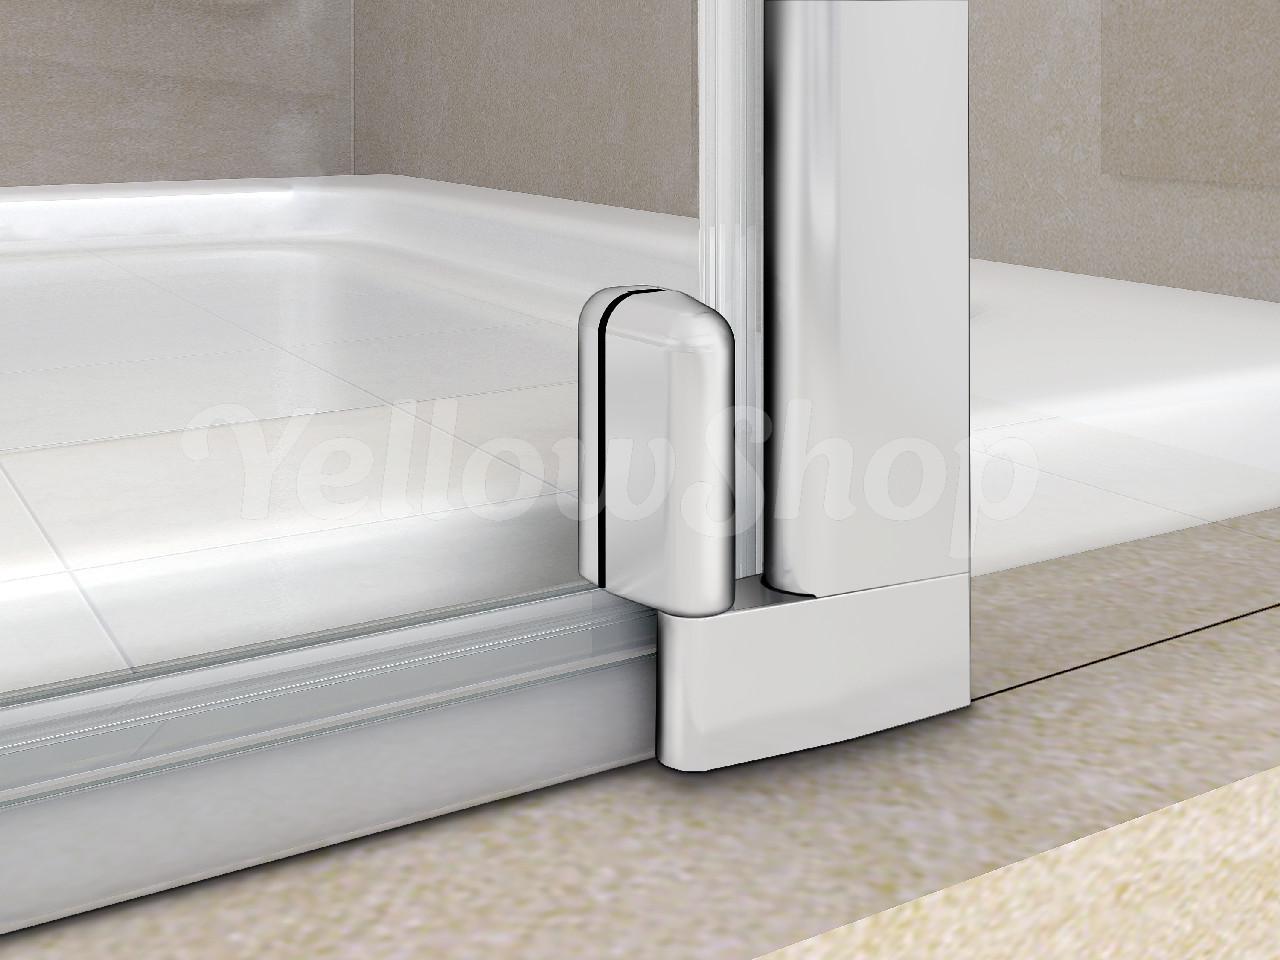 Parete Vasca Da Bagno : Parete vasca sopravasca battente cristallo trasparente mm bagno